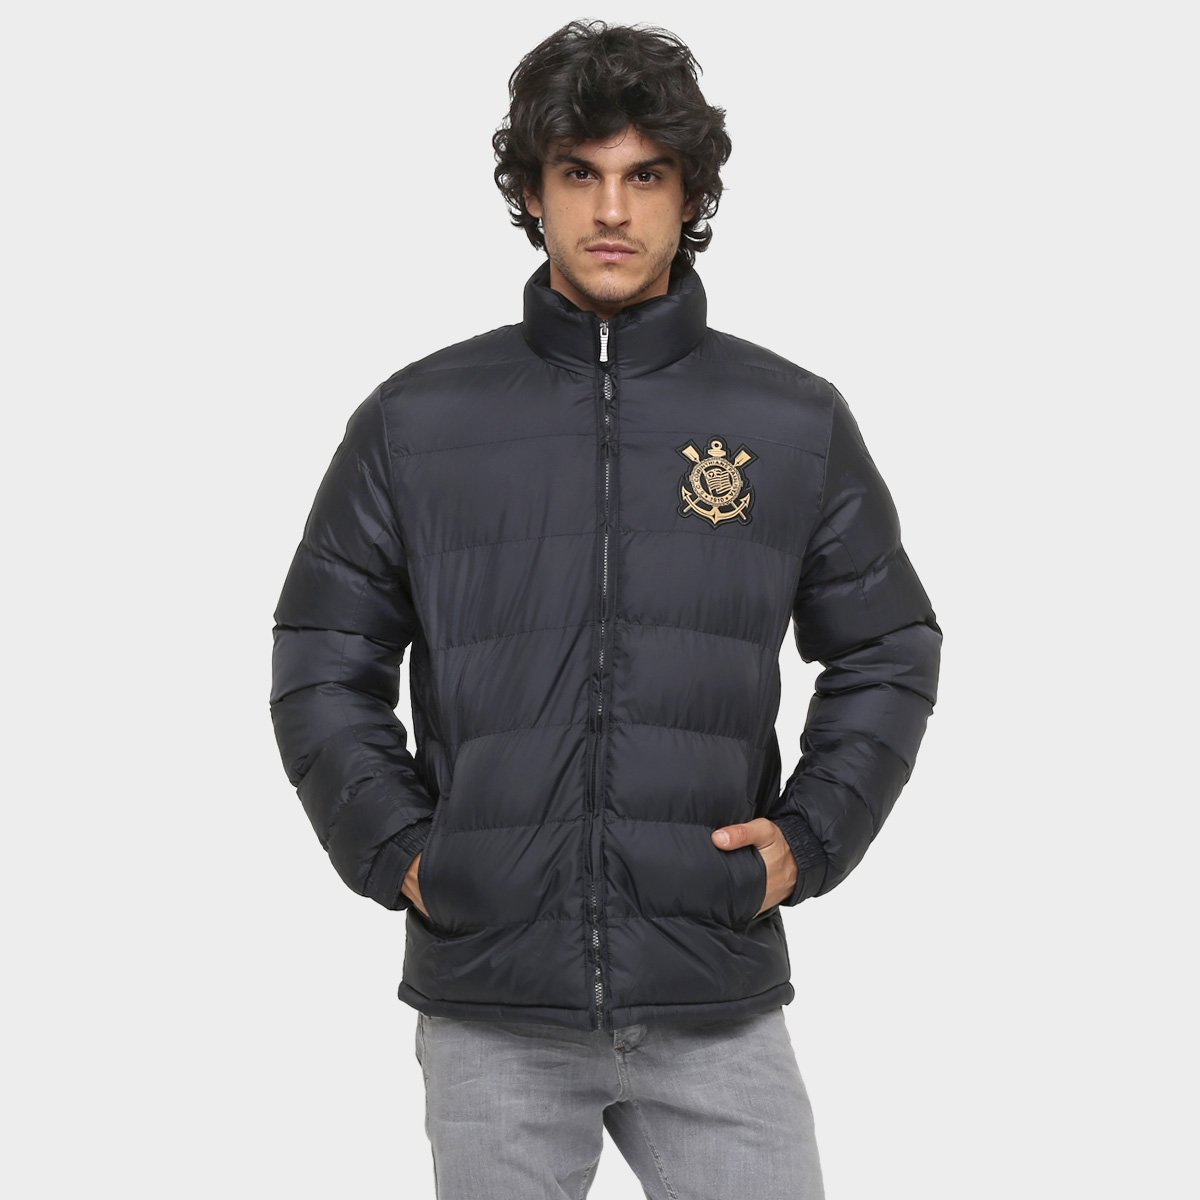 Jaqueta Corinthians Super Argan Masculina - Preto e Dourado - Compre ... 80026b7216b74